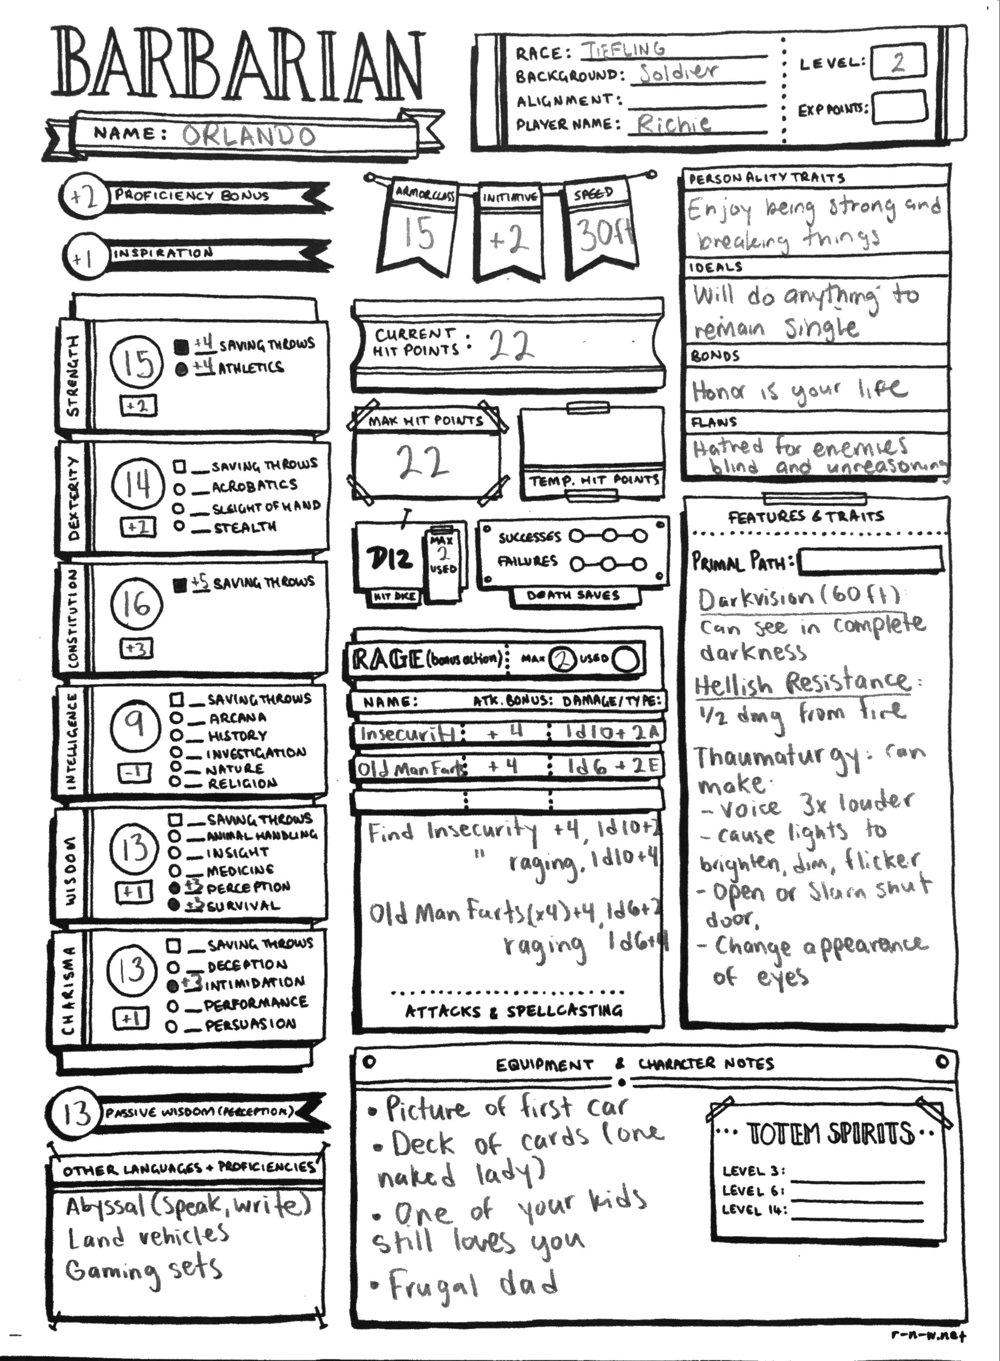 Character Sheet Art by Rose Nadia Whittaker